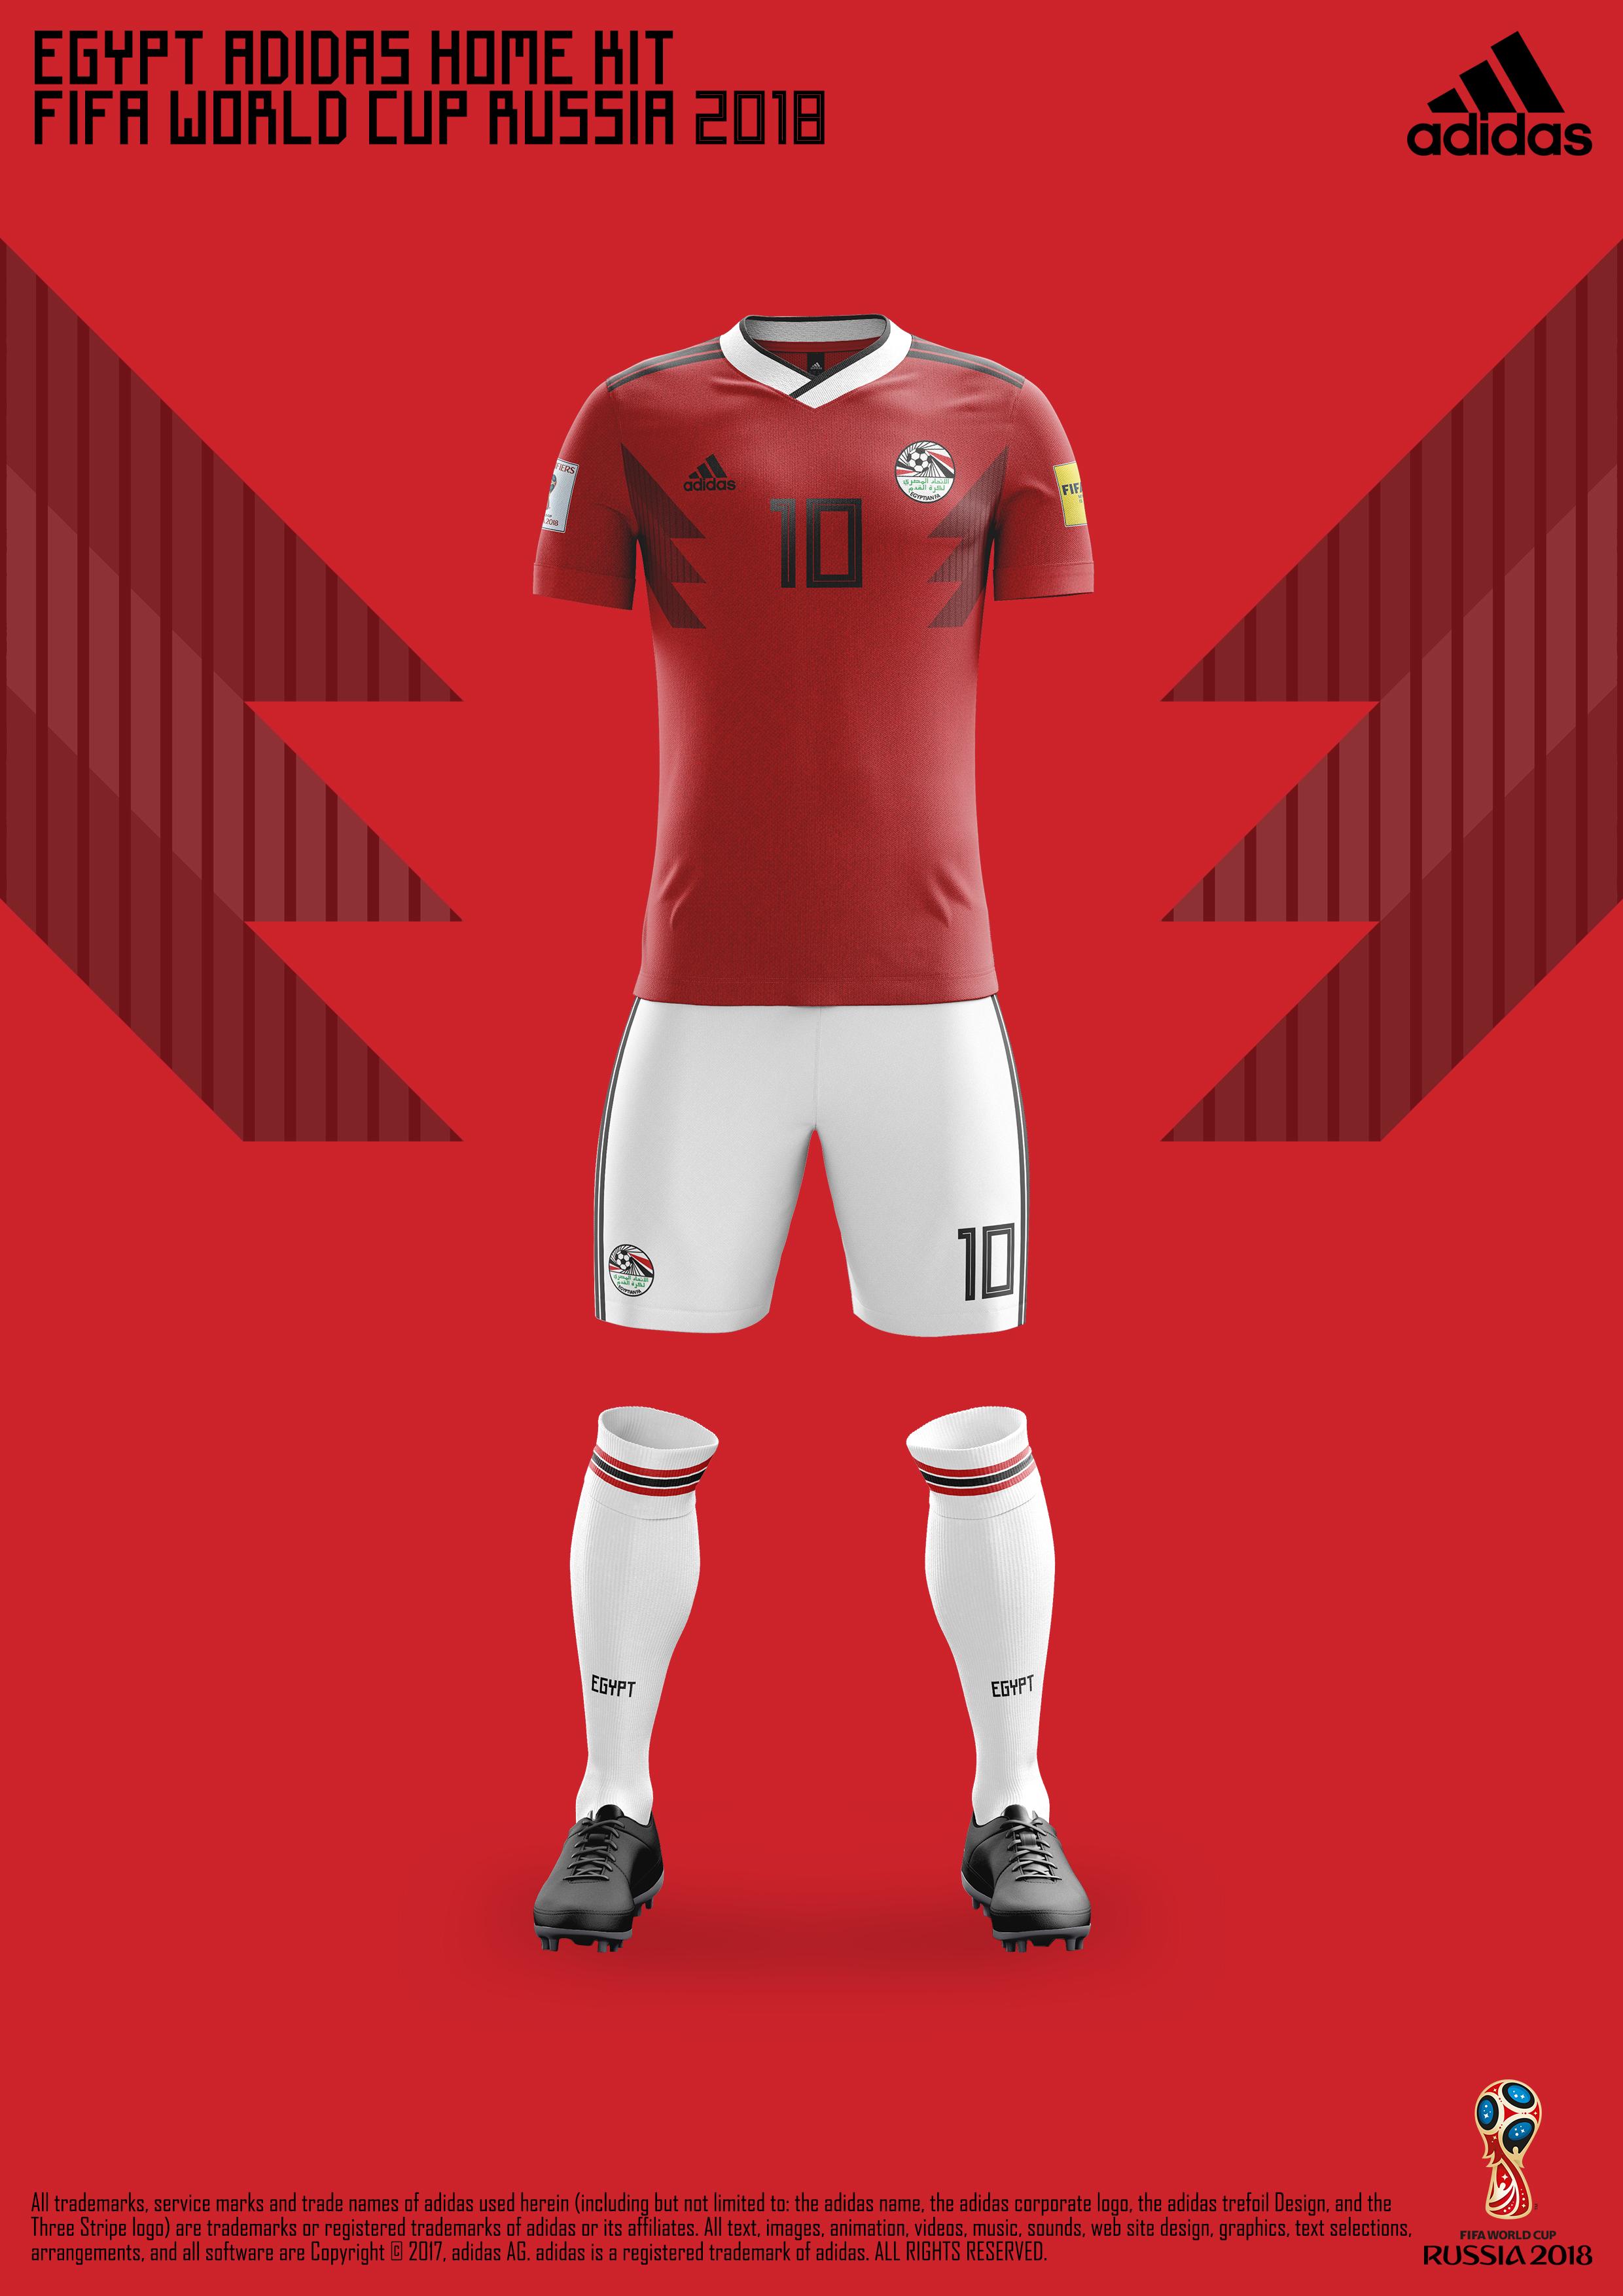 5f700dbf50071 Egypt FA Adidas® Kits - FIFA World Cup Russia 2018™ on Behance